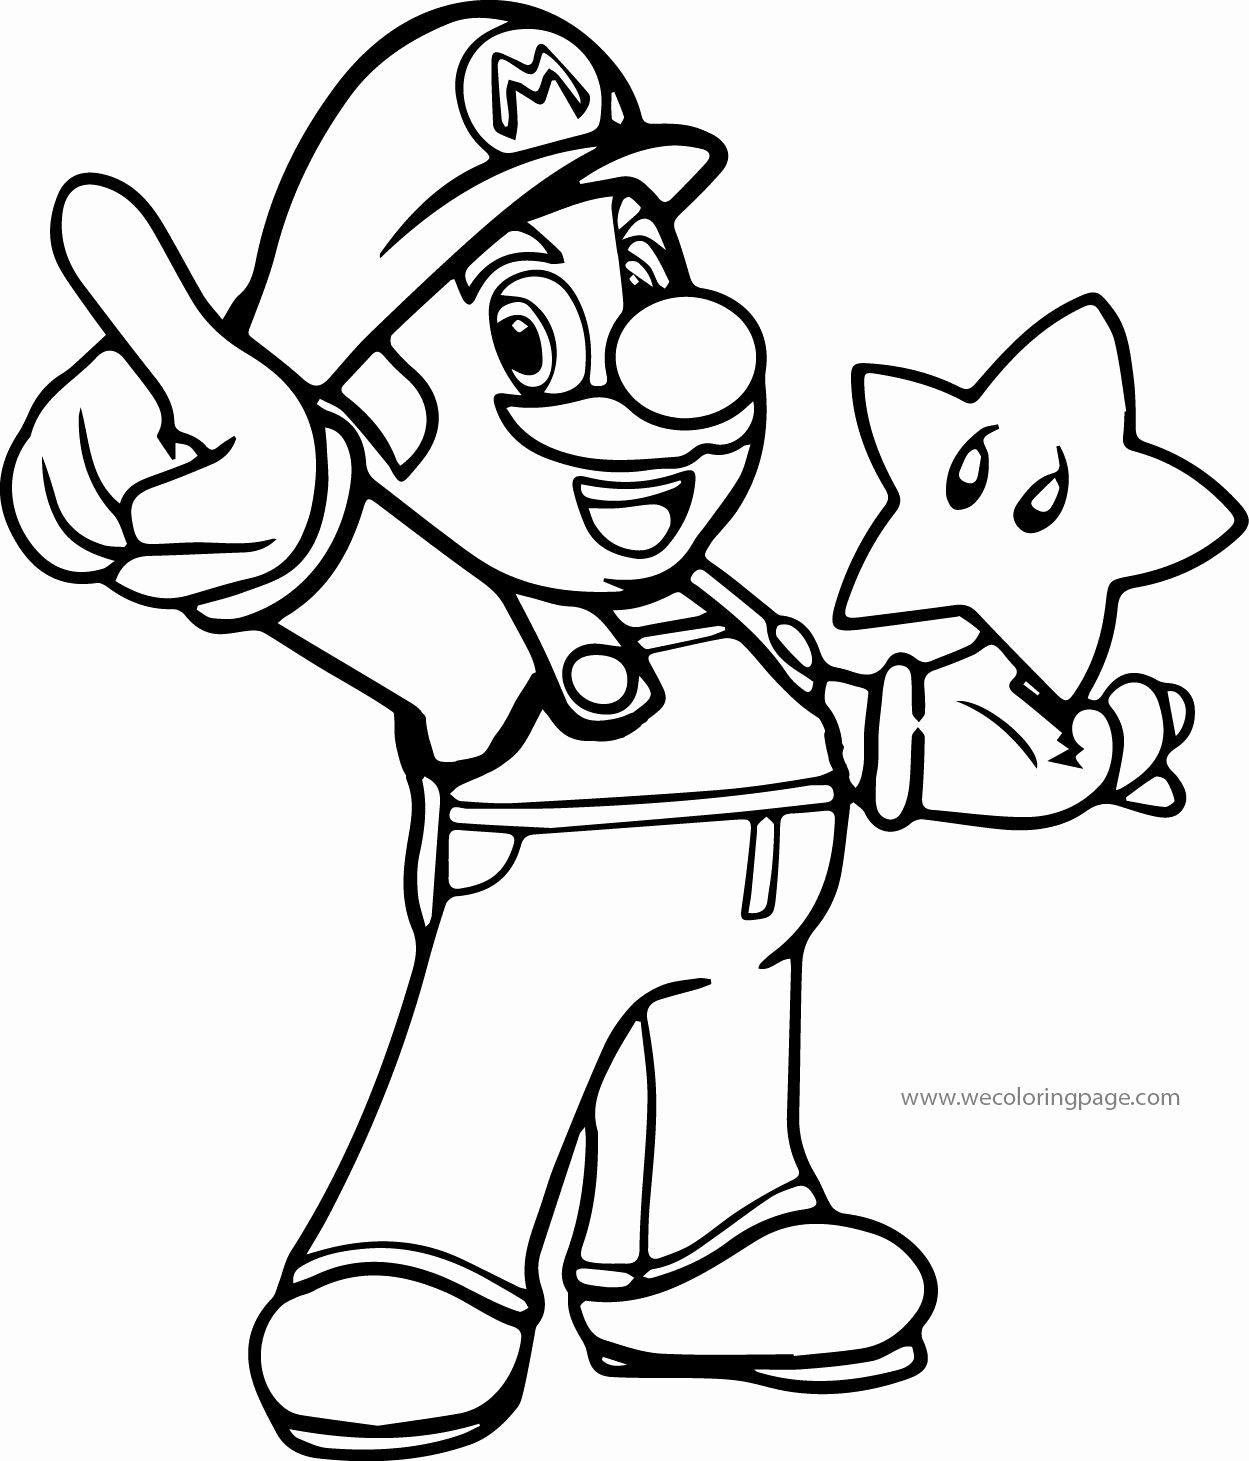 - √ 32 Super Mario Coloring Book (With Images) Mario Coloring